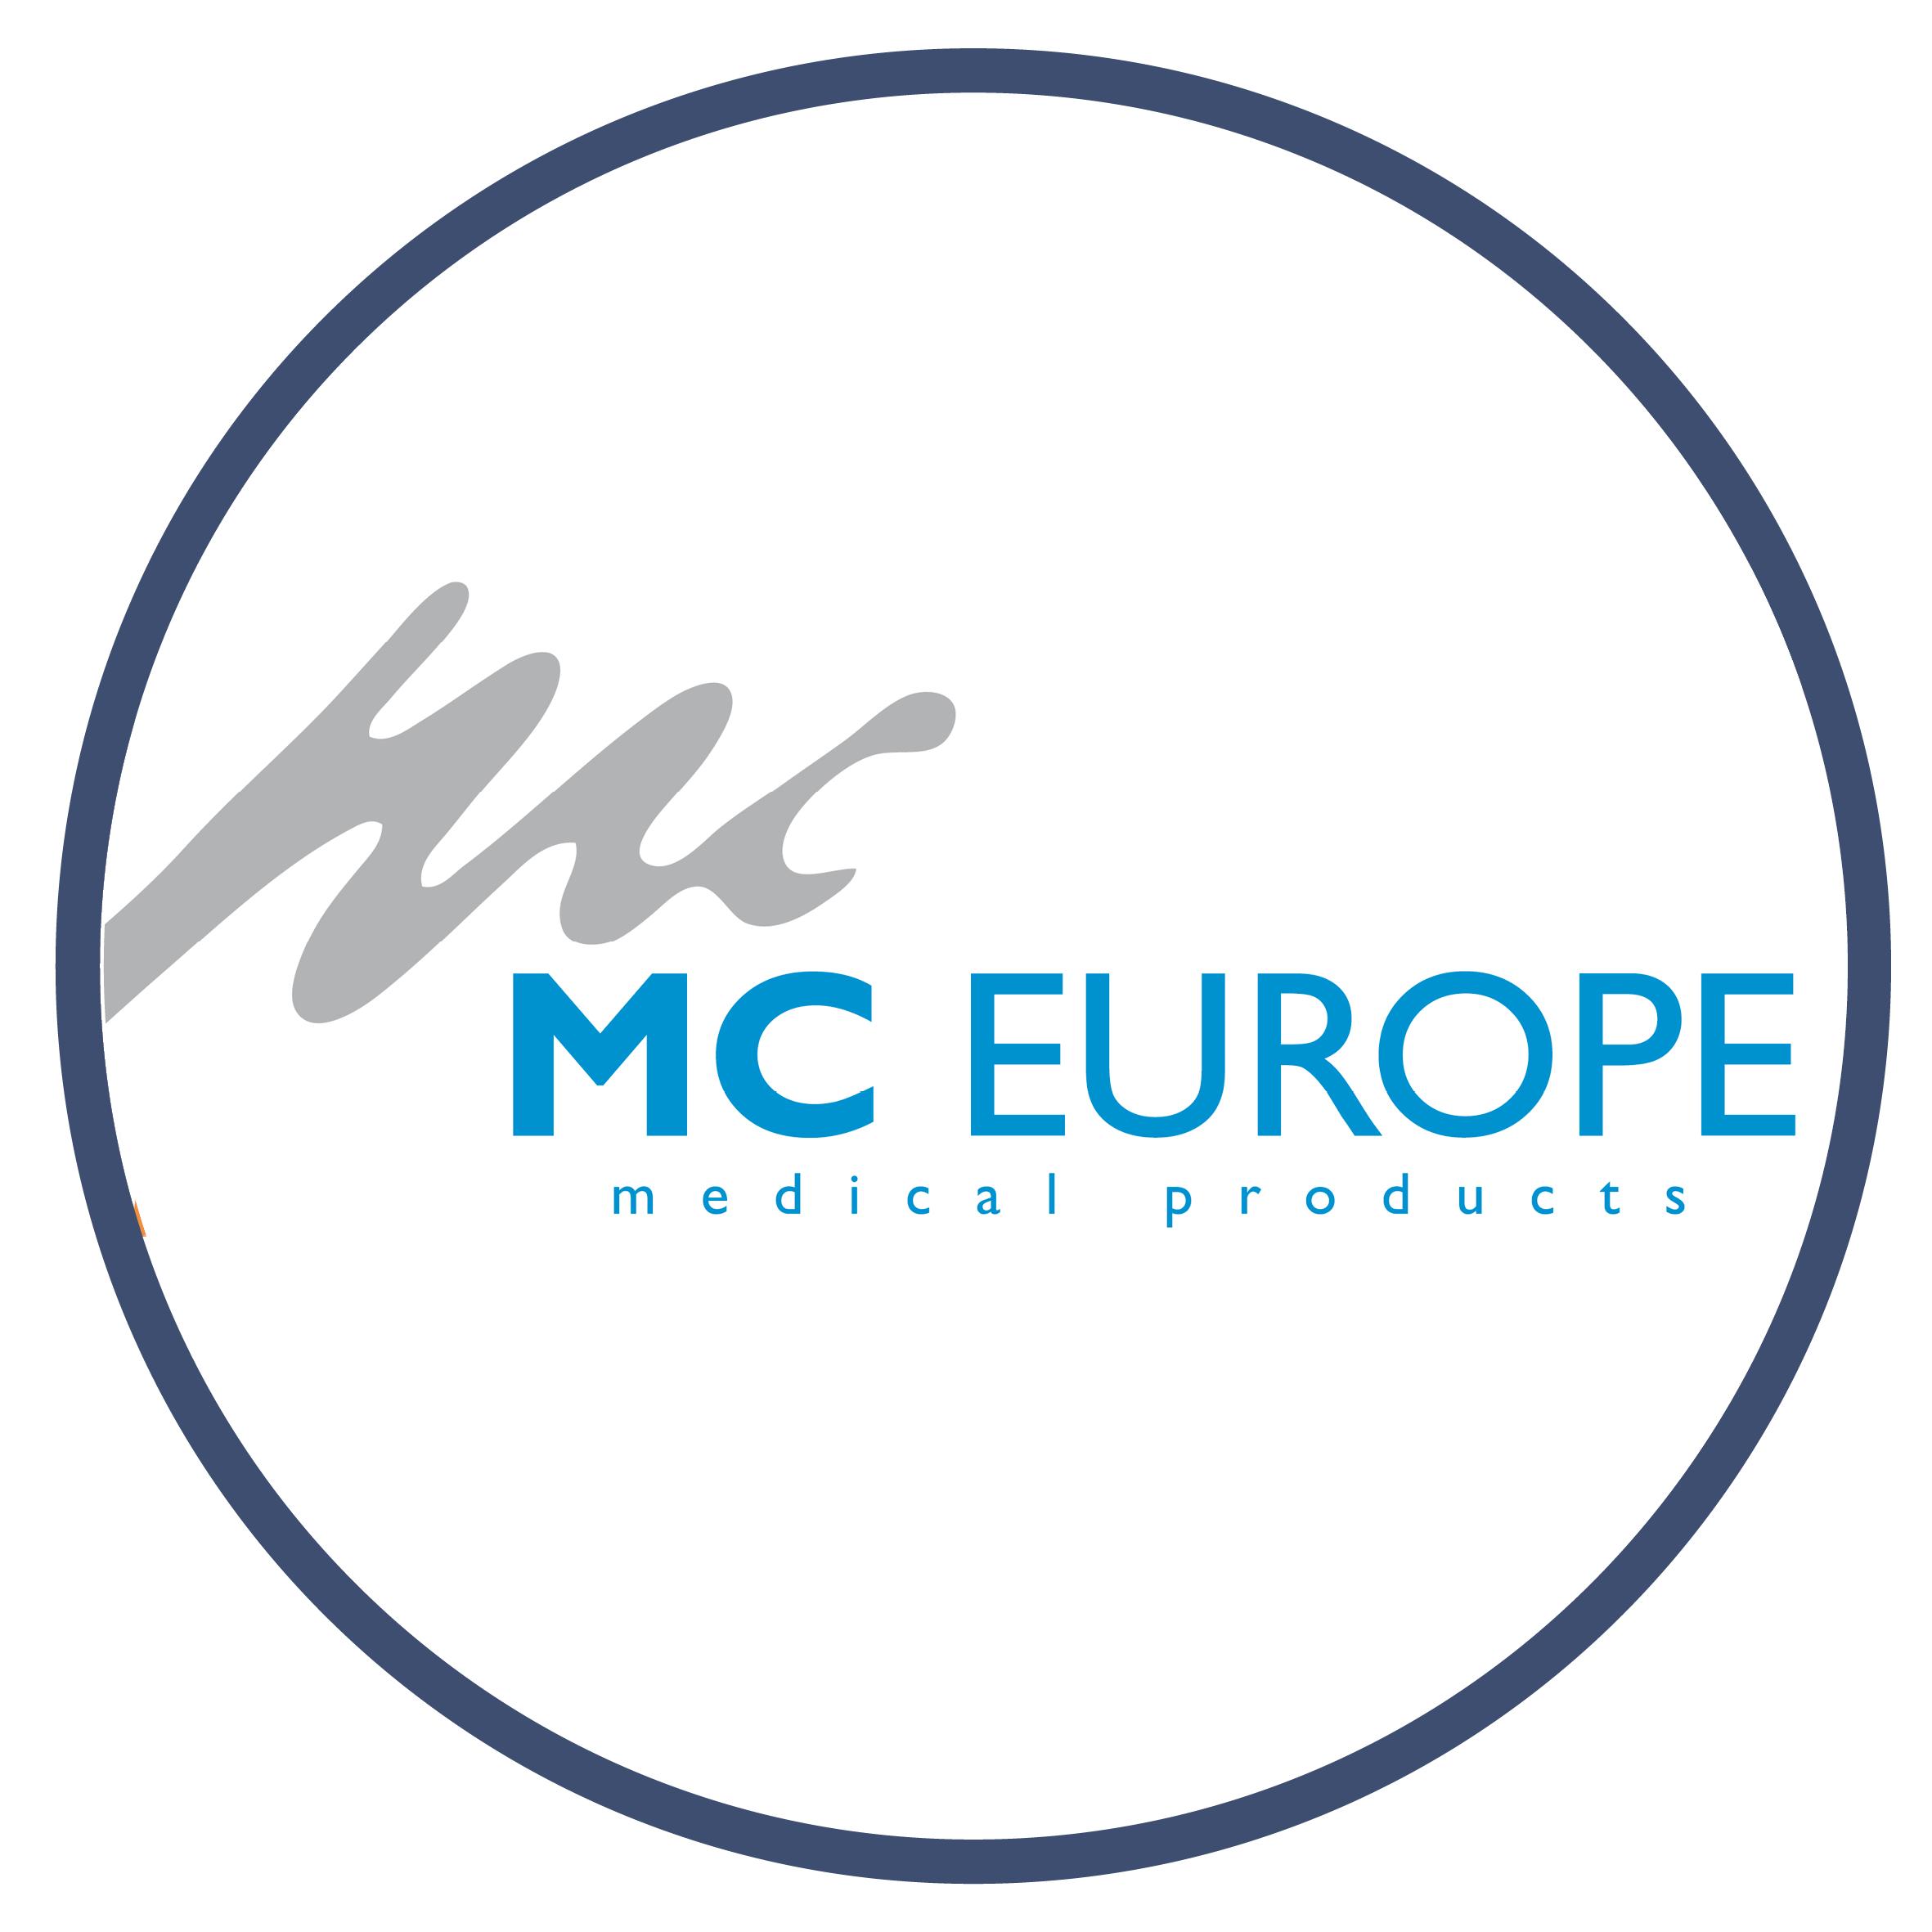 MC Europe